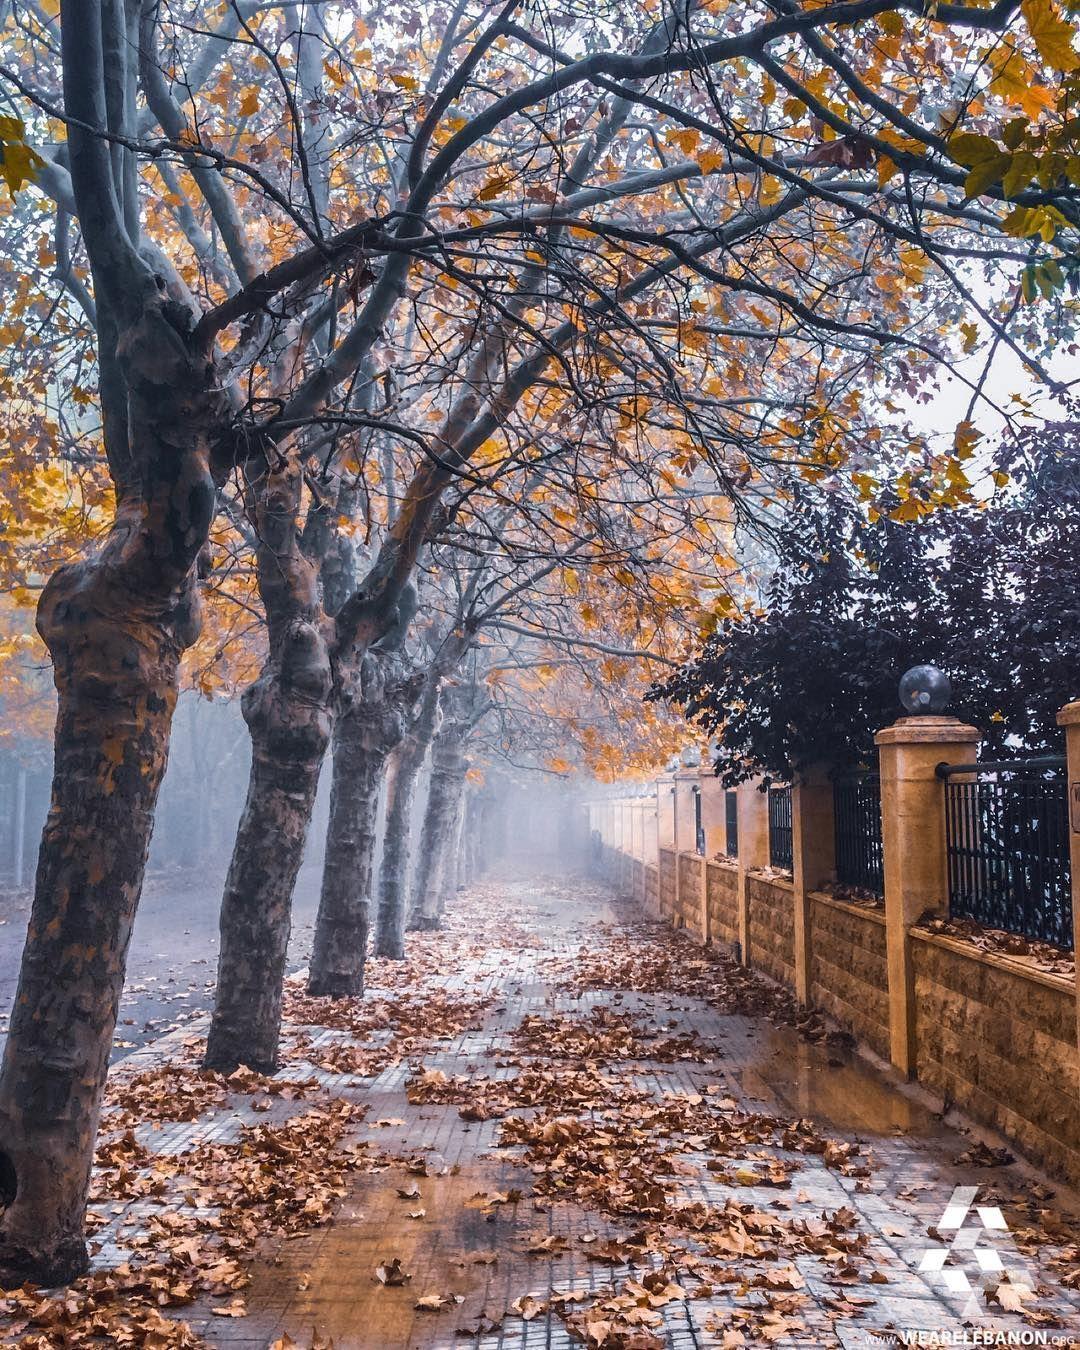 Autumn Morning Sawfar Lebanon At At We Are Lebanon Wearelebanon لبنان صوفر صباح الخريف Instagram Calm After The Storm Autumn Magic